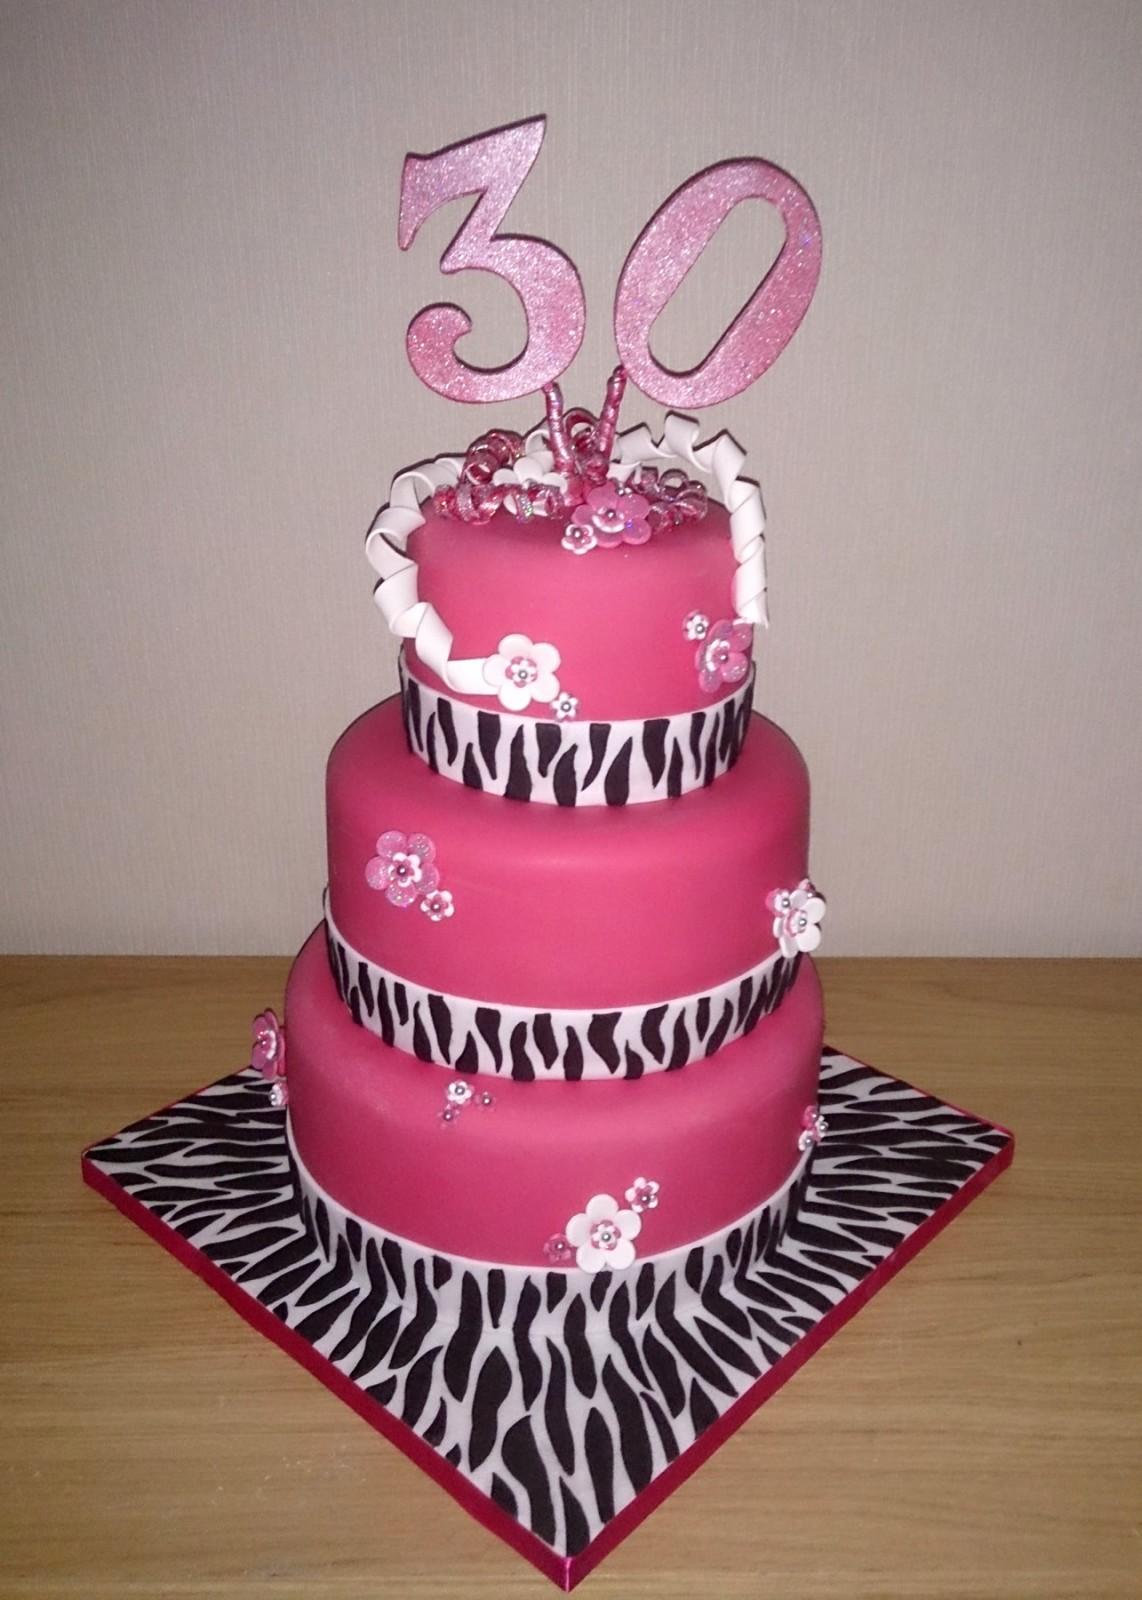 Pleasant 3 Tier Zebra Print 30Th Birthday Cake Susies Cakes Funny Birthday Cards Online Alyptdamsfinfo